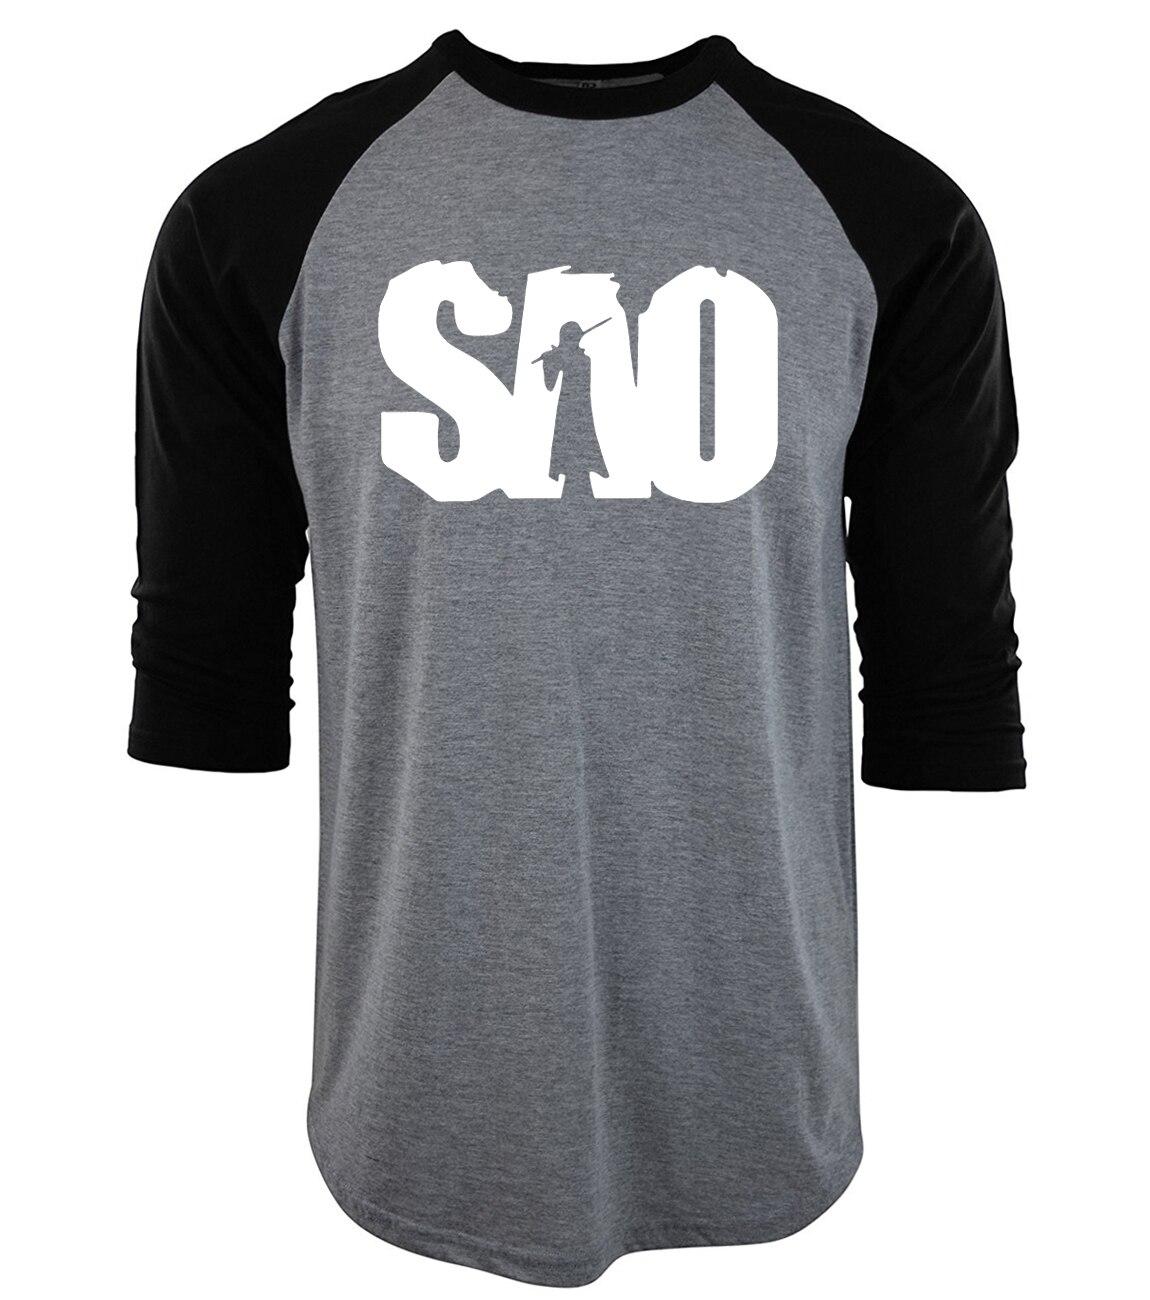 Sword art online sao anime t shirt fashion 2017 cotton for Mens t shirt online